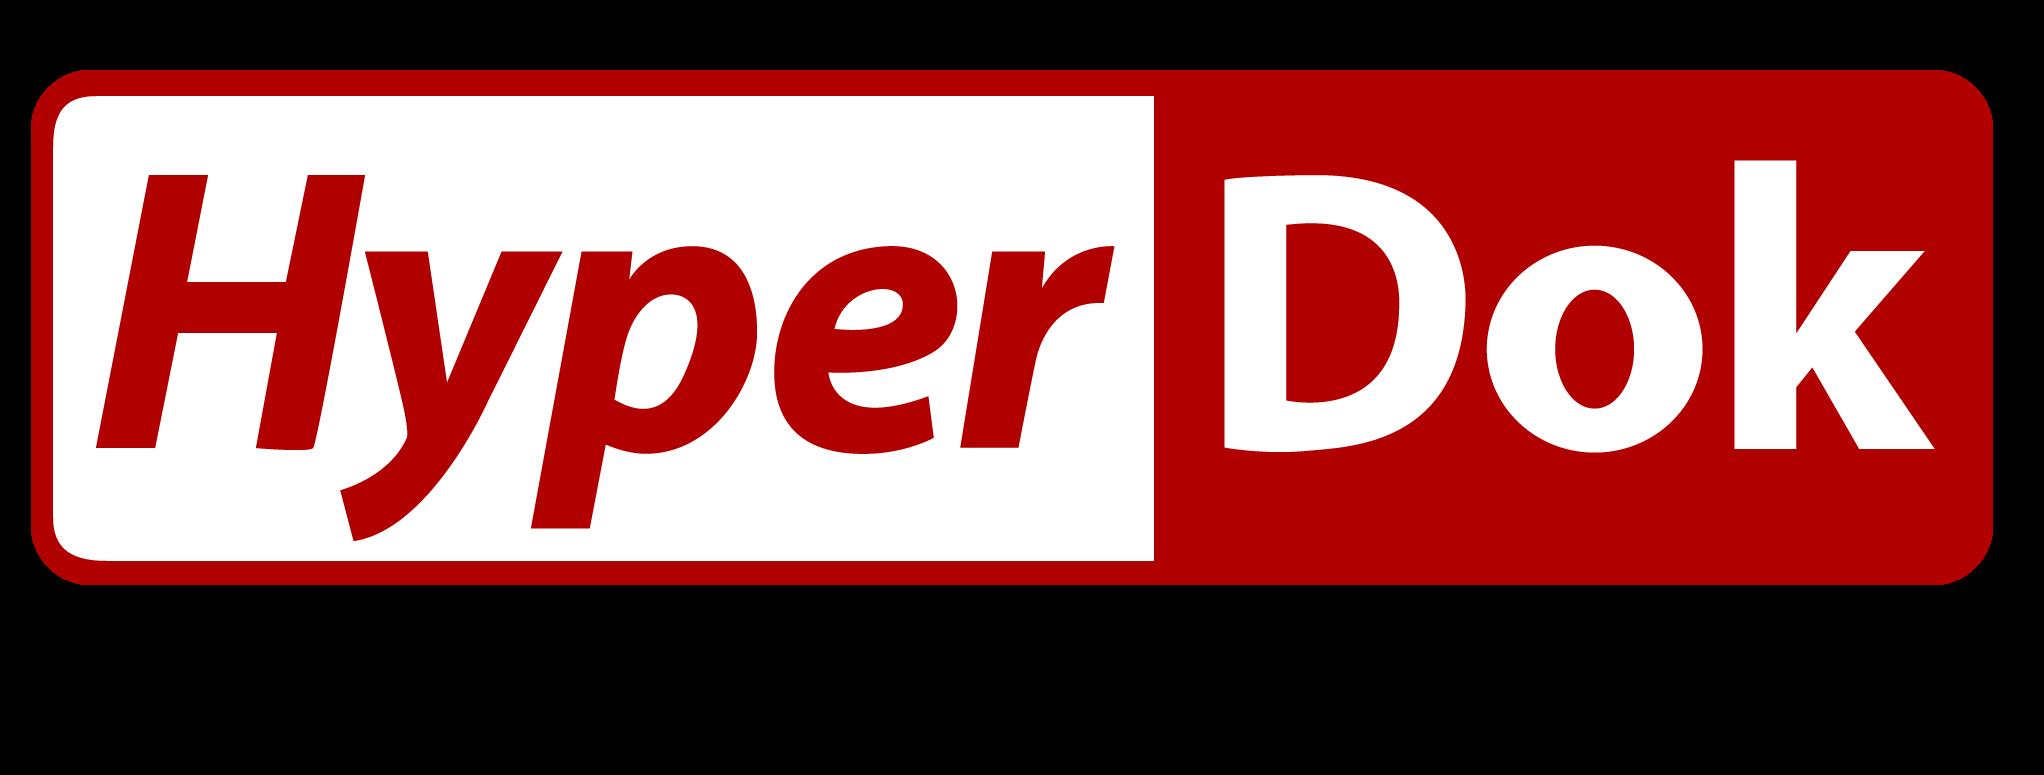 hyperdok